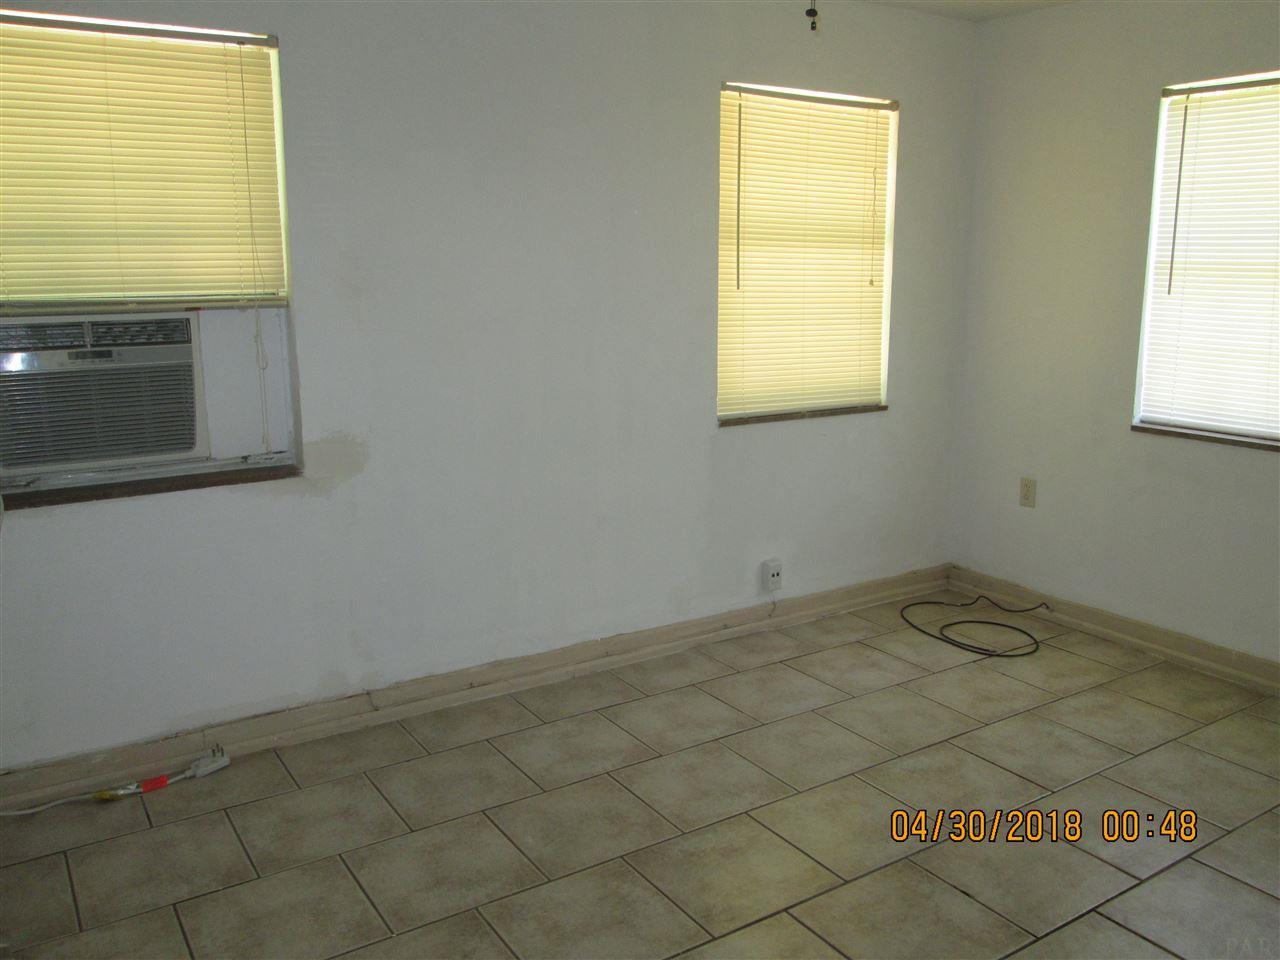 106 Jardine Rd, Pensacola, FL 32507